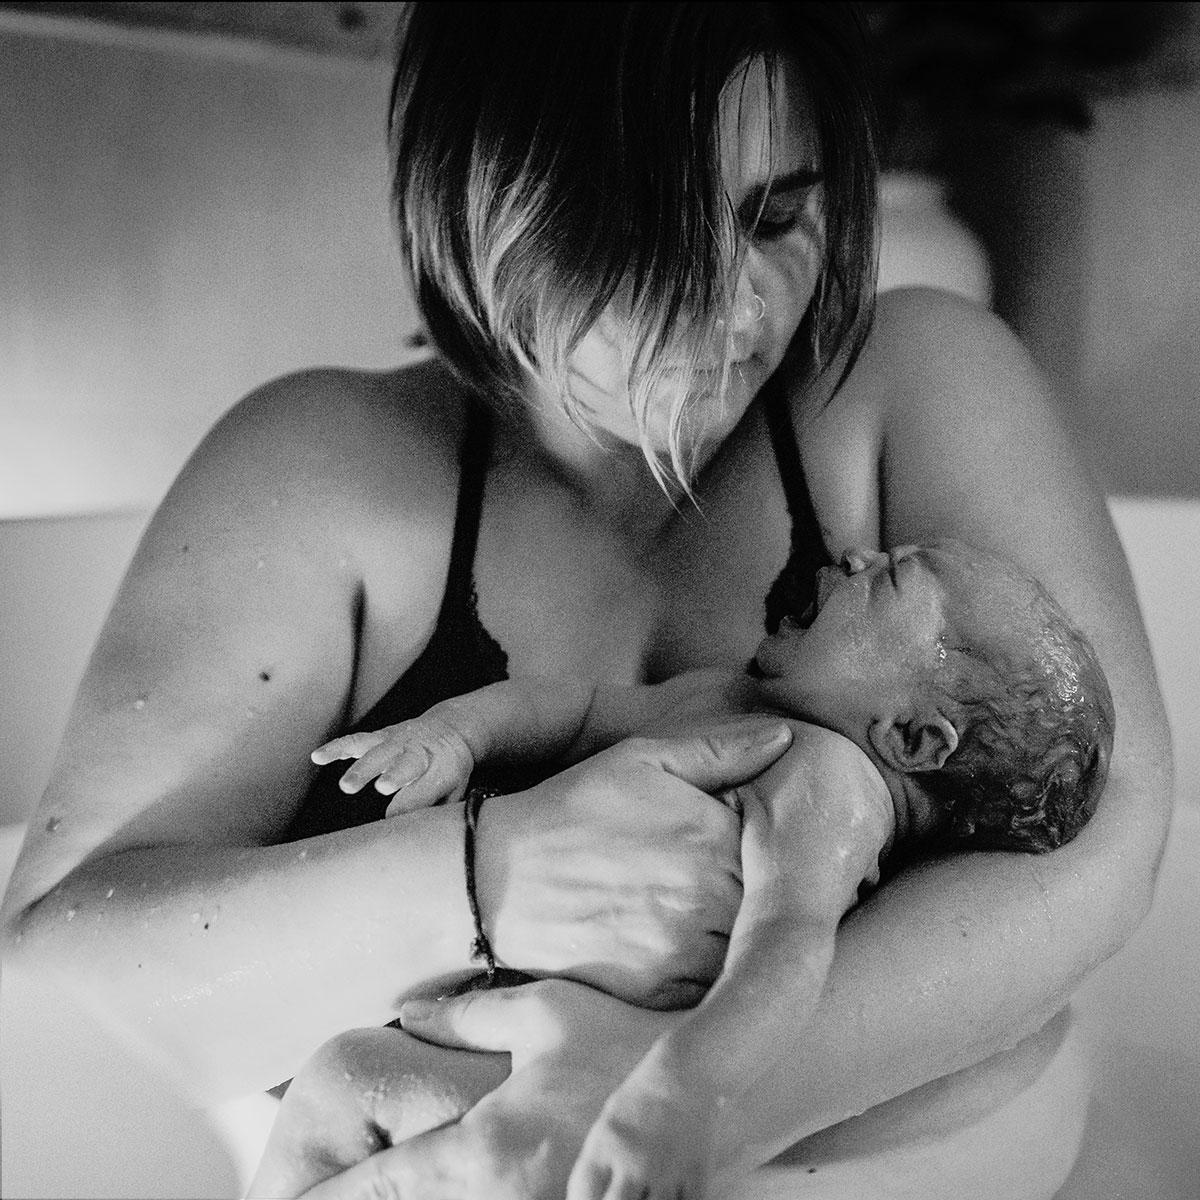 newborn baby photography born at Andaluz waterbirth center in Portland, Oregon